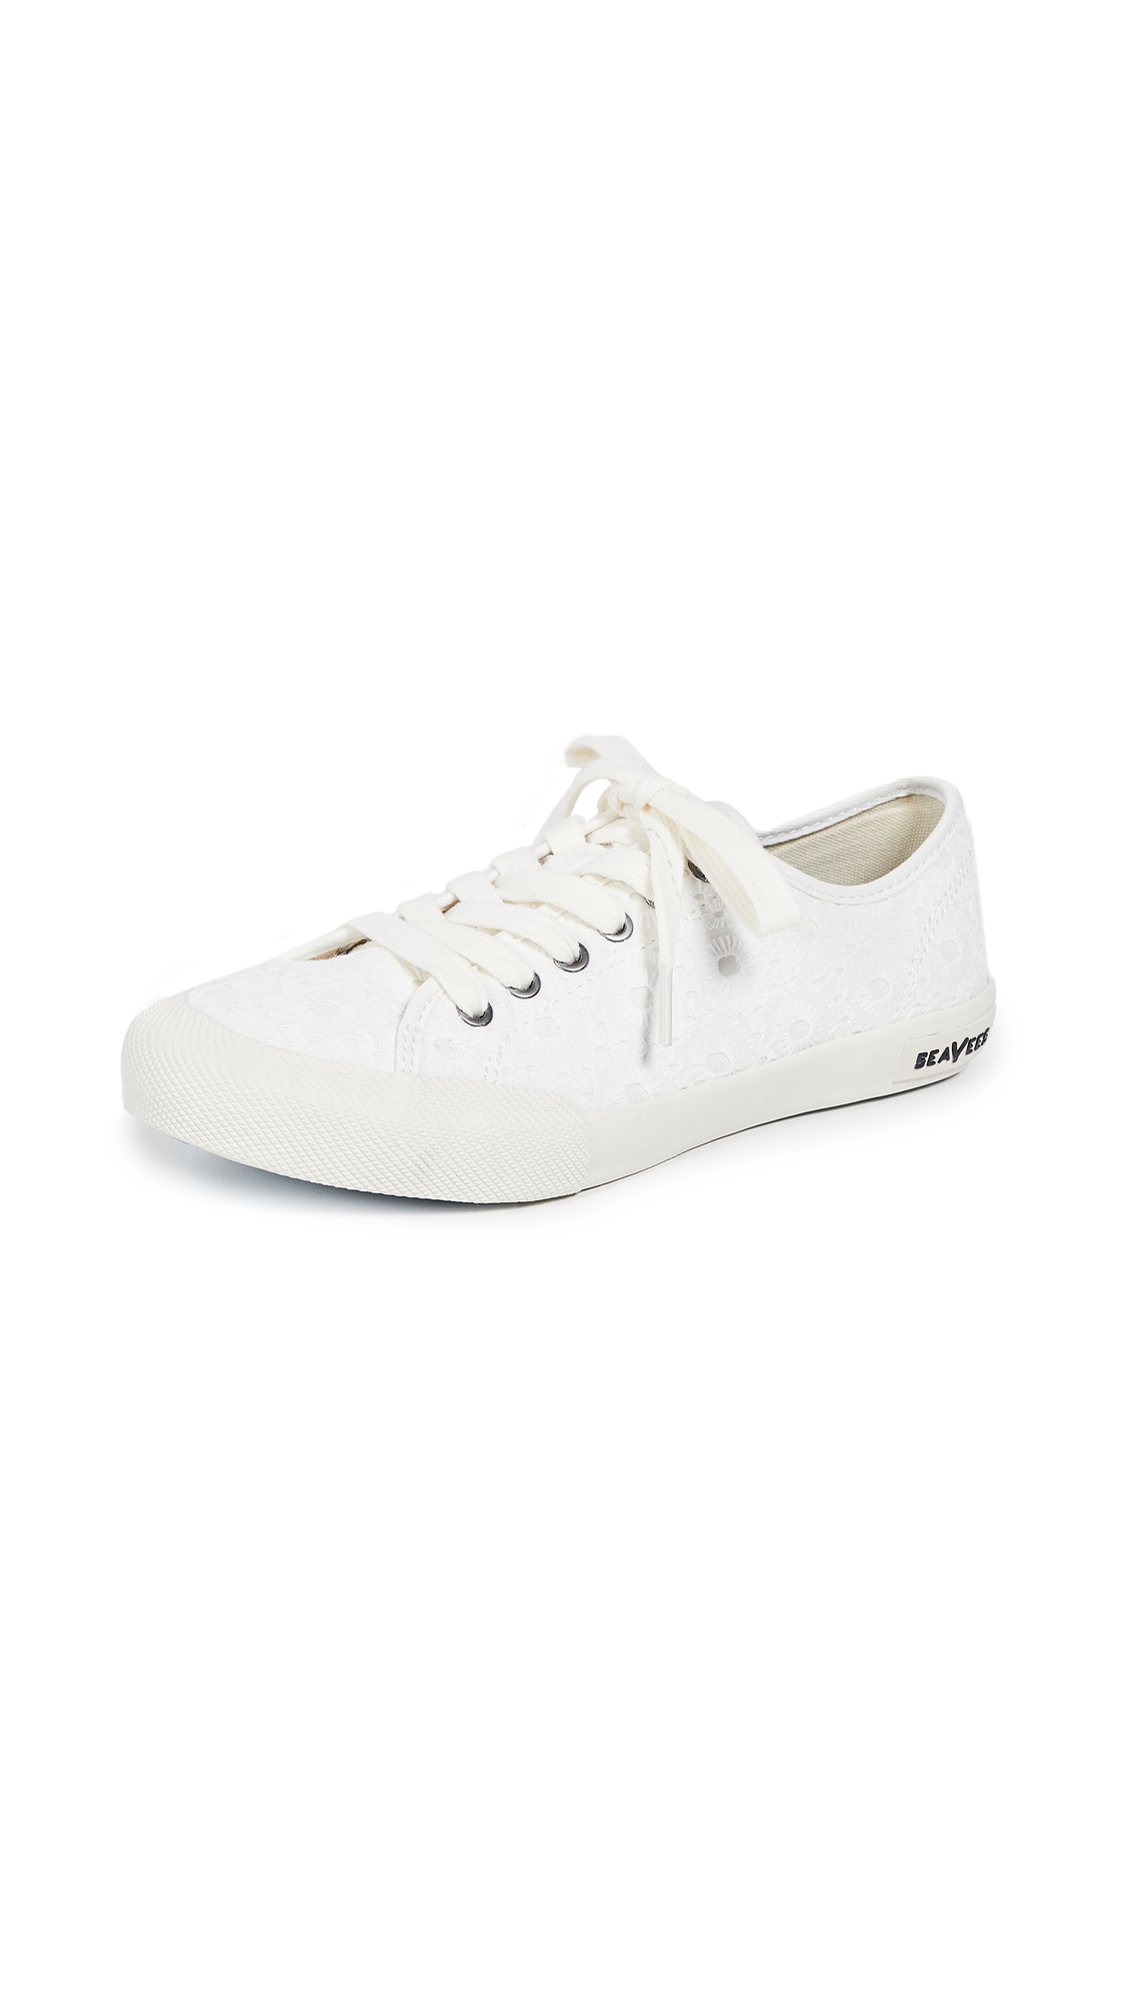 SeaVees Monterey Embroidery Sneakers - White Eyelet